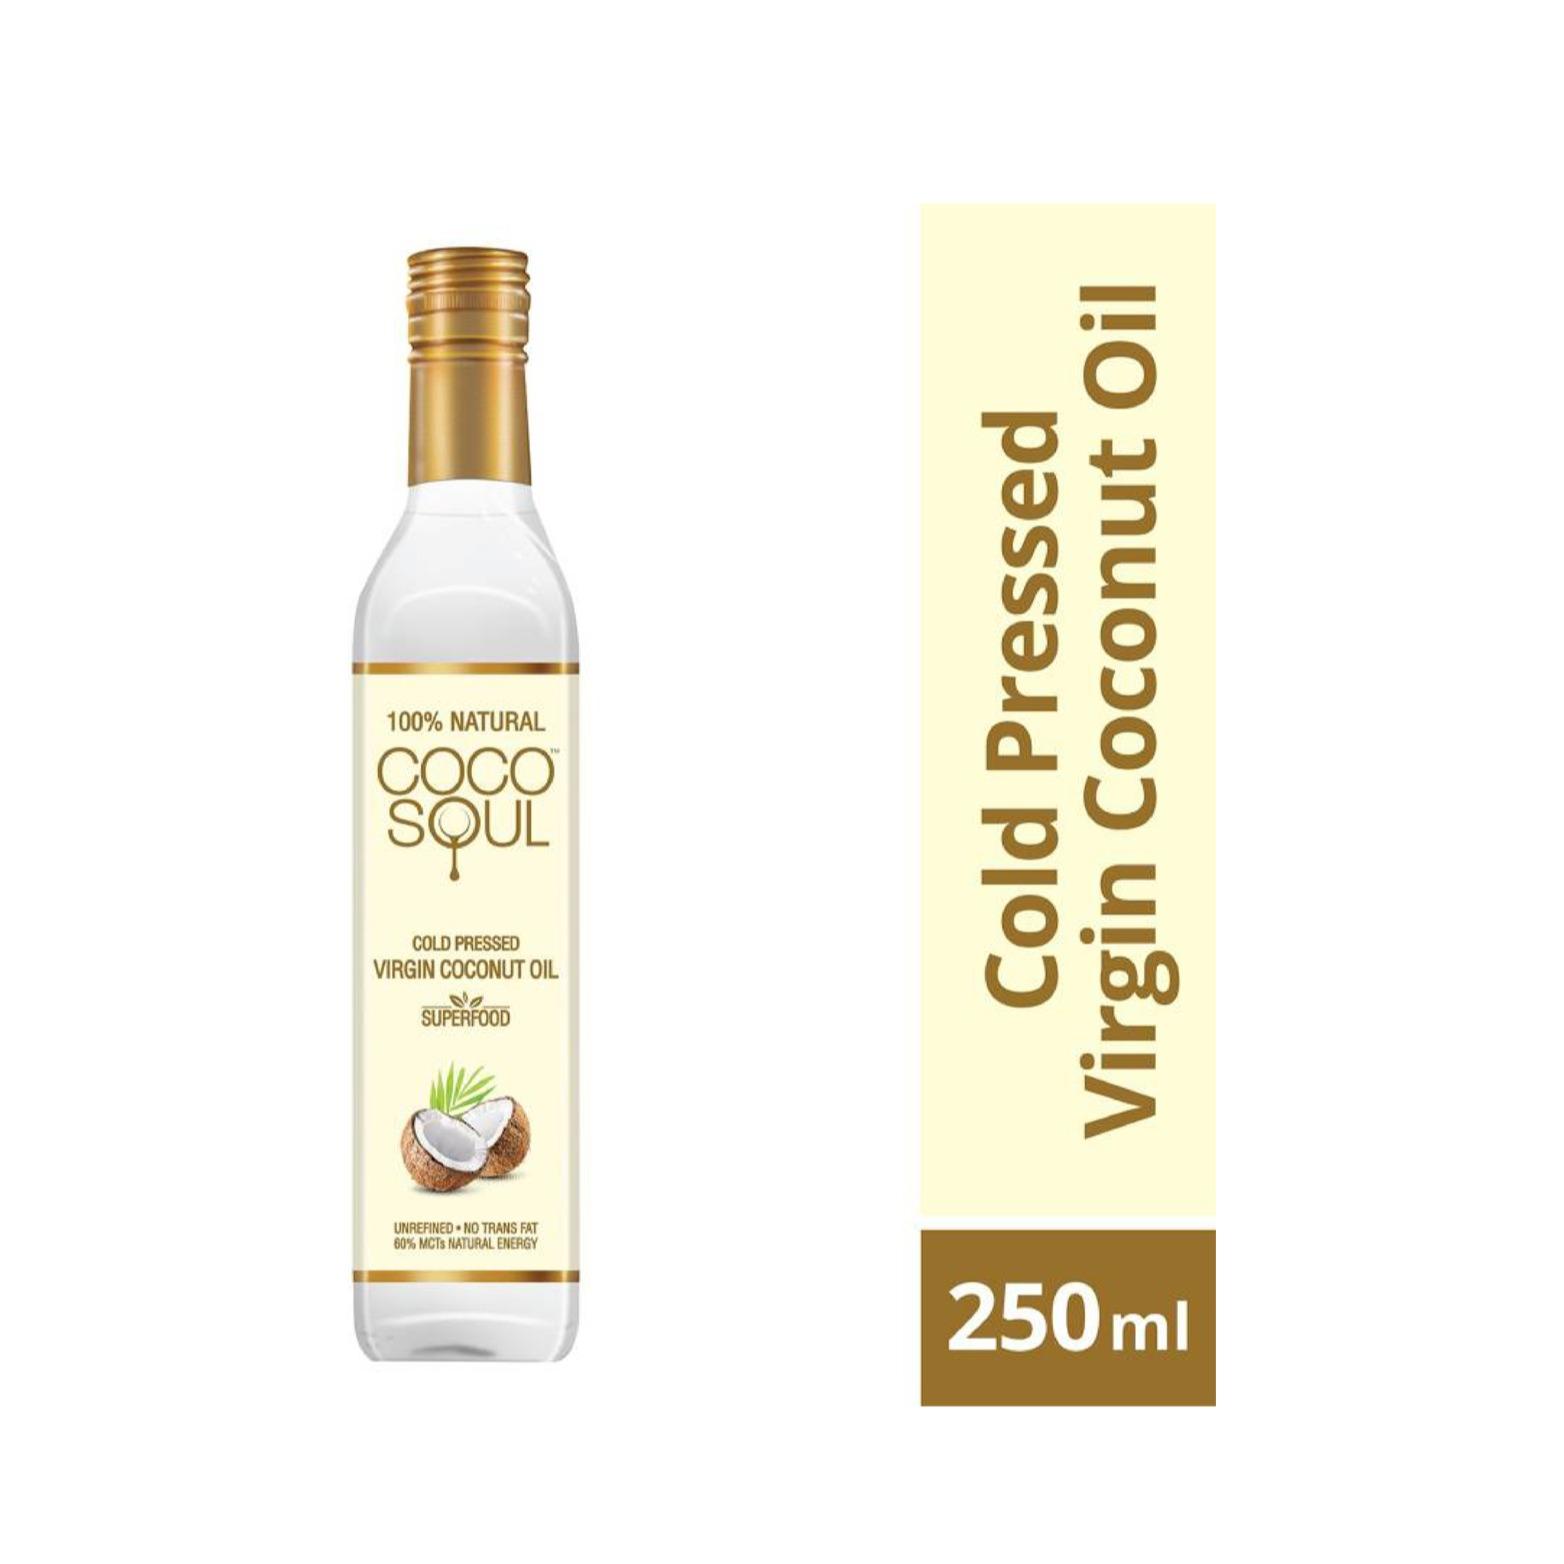 Coco Soul Cold Pressed Natural Virgin Coconut Oil Plastic Bottle Price in India - Buy Coco Soul Cold Pressed Natural Virgin Coconut Oil Plastic Bottle online at Flipkart.com